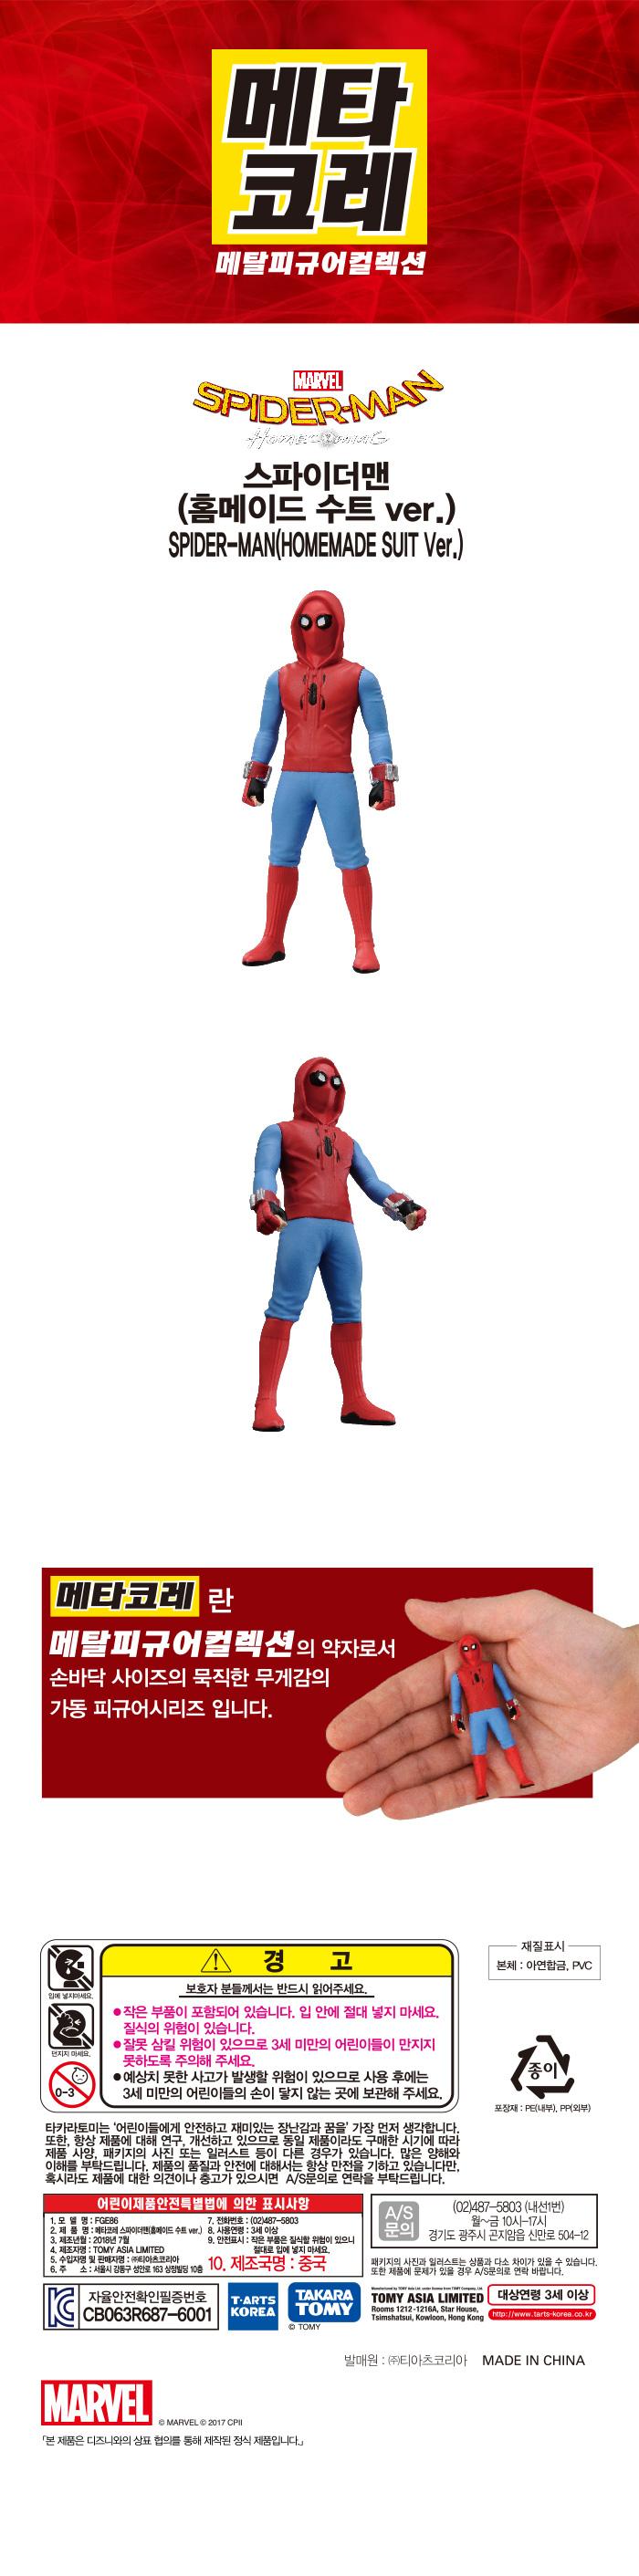 S(homemade-suit).jpg